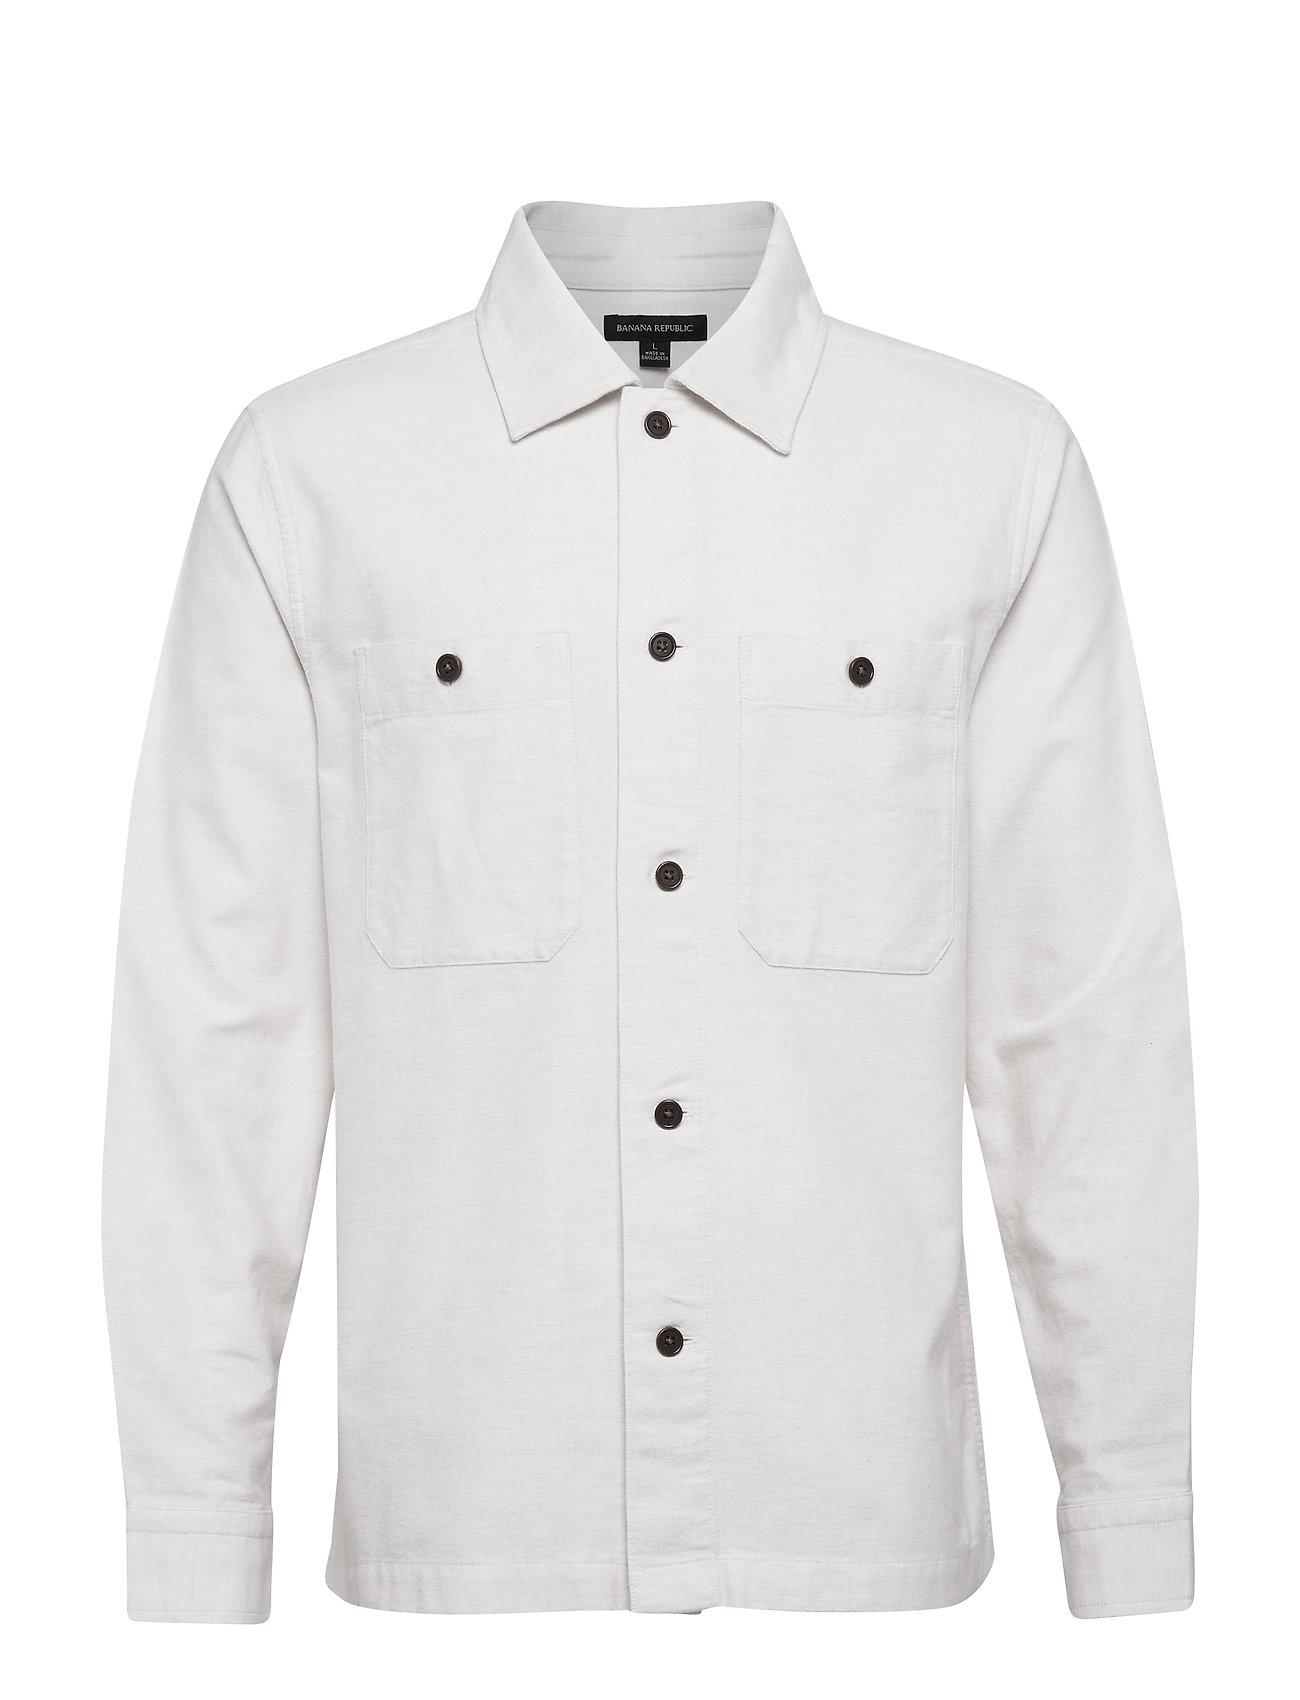 Banana Republic Slim-Fit Flannel Shirt Jacket - ECRU